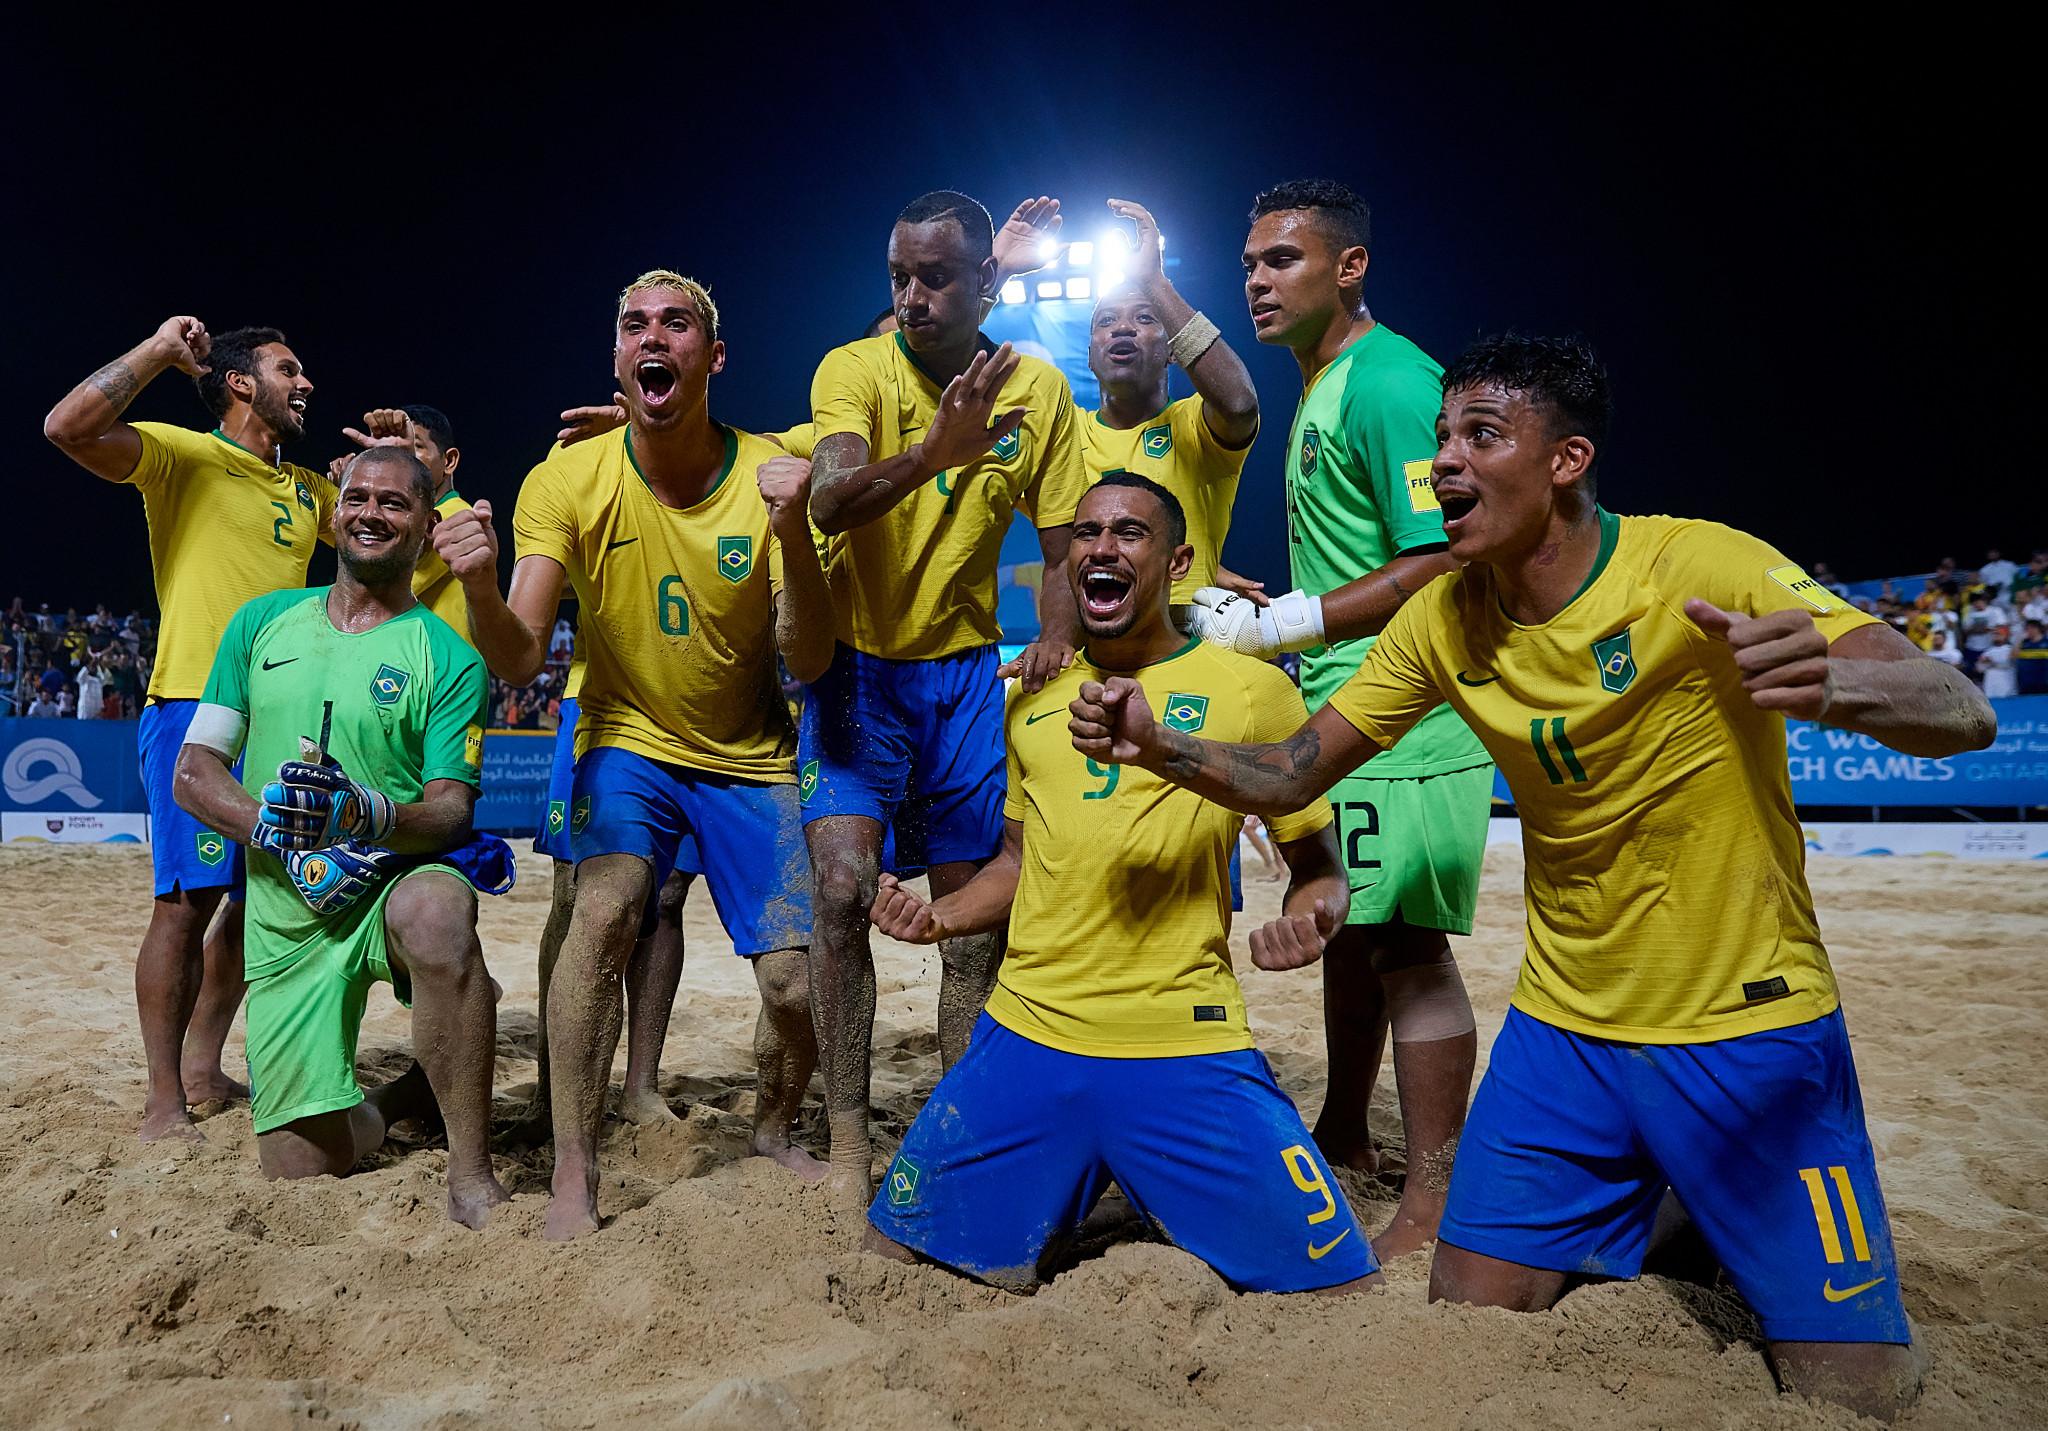 Brazil live up to samba reputation to claim ANOC World Beach Games soccer gold